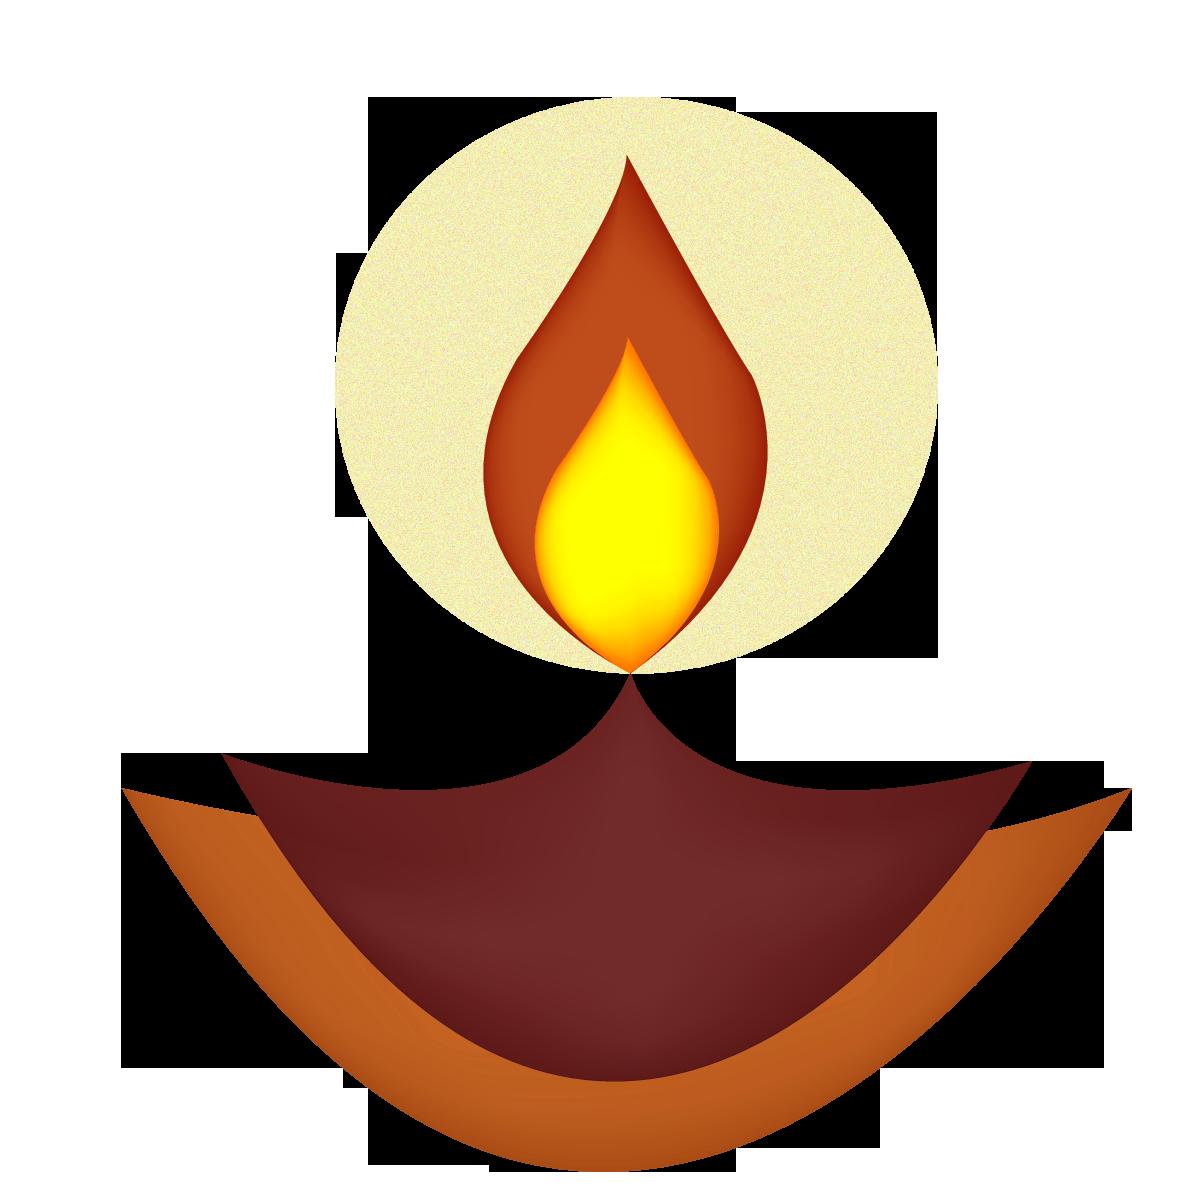 Download Diwali Free Download Png HQ PNG Image   FreePNGImg for Diwali Lantern Png  570bof